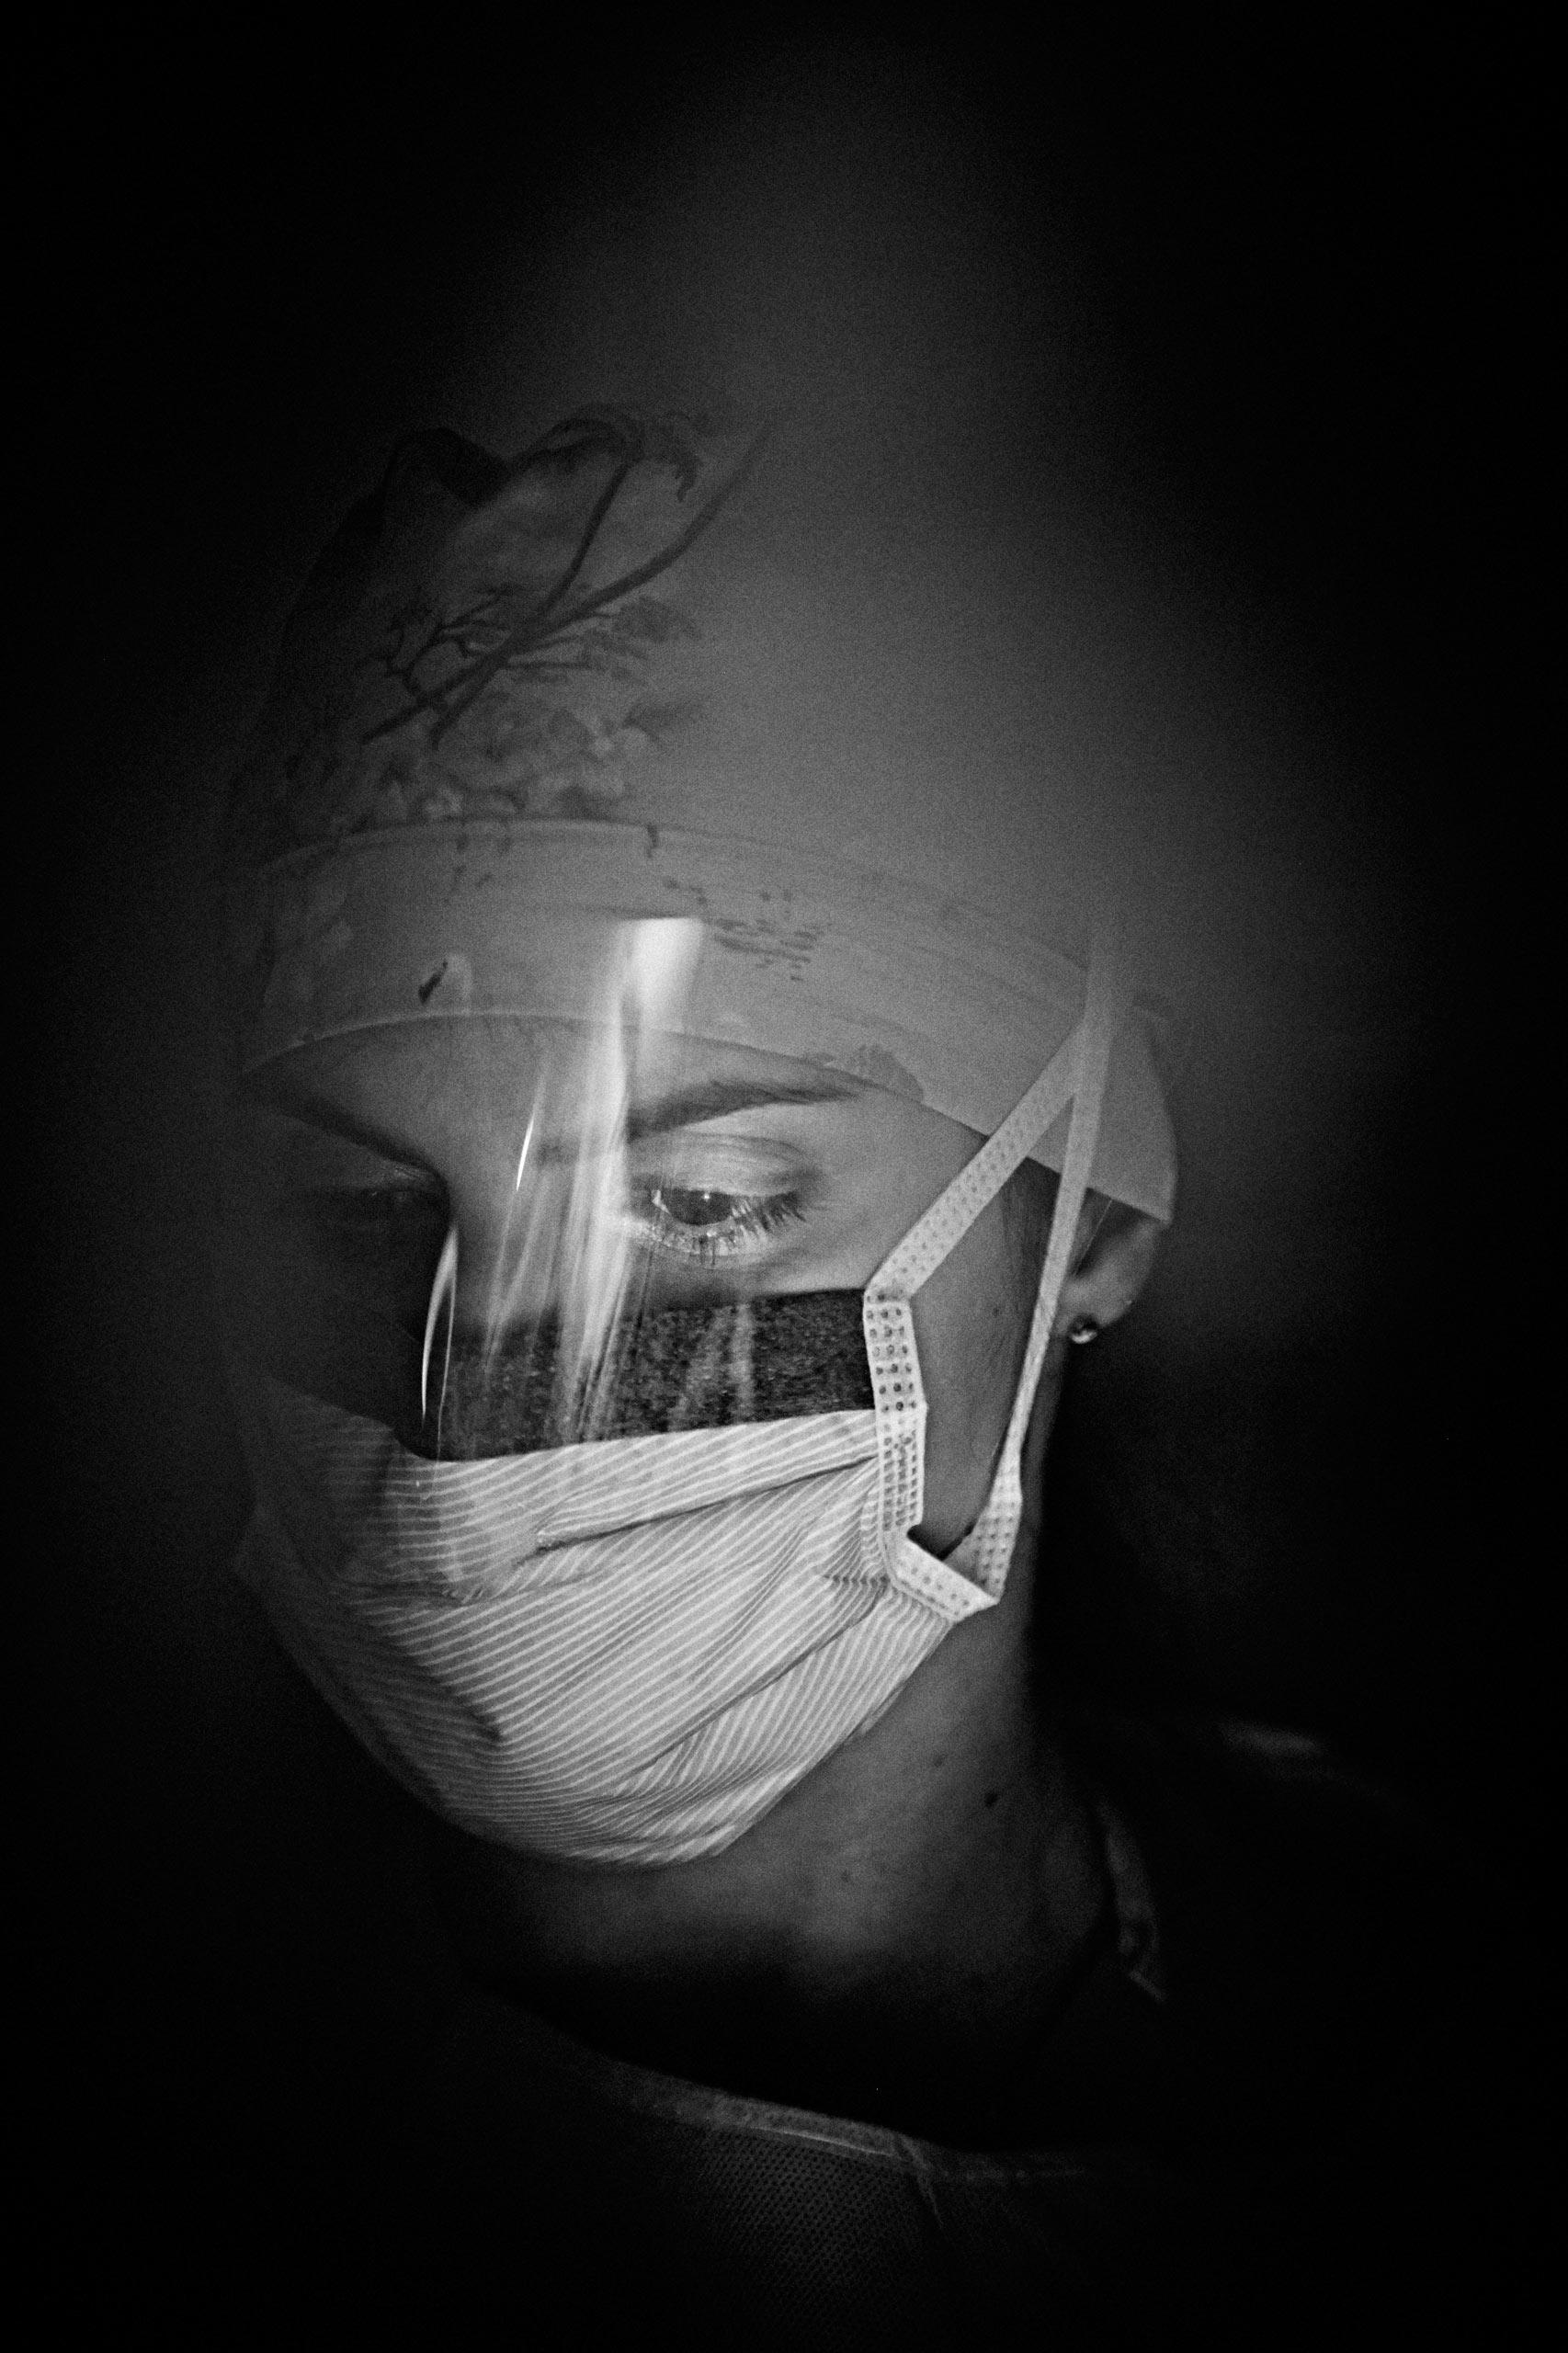 Chief Surgery Resident Dr. Arghavan Salles on rotation at Santa Clara Valley Medical Center in San Jose, California, on March 27, 2015.